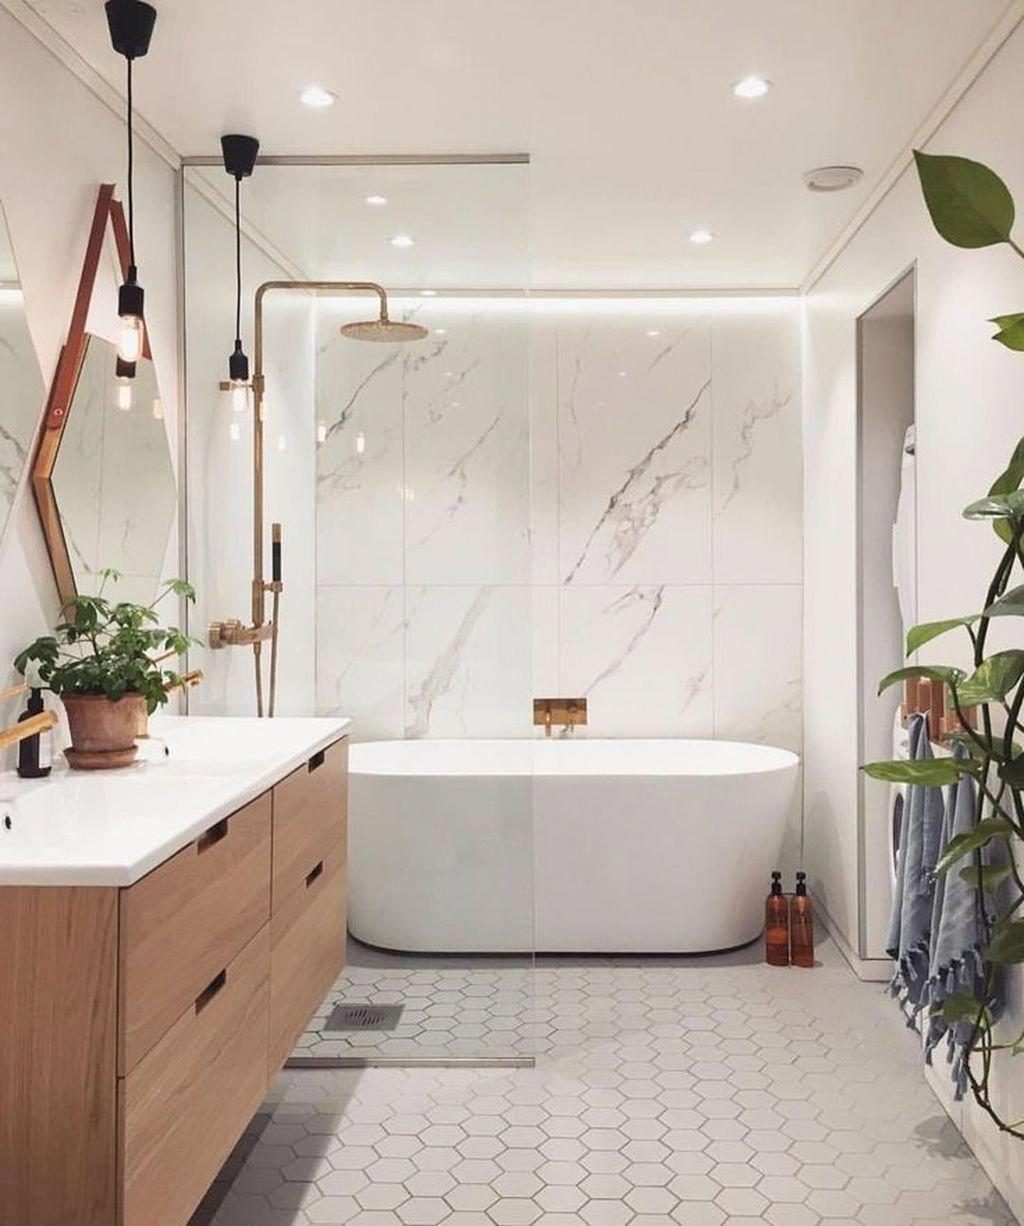 30 Excellent Bathroom Design Ideas You Should Have A Bathroom Designs Idea Can I Re Bathroom Interior Design Bathroom Remodel Master Bathroom Renovations